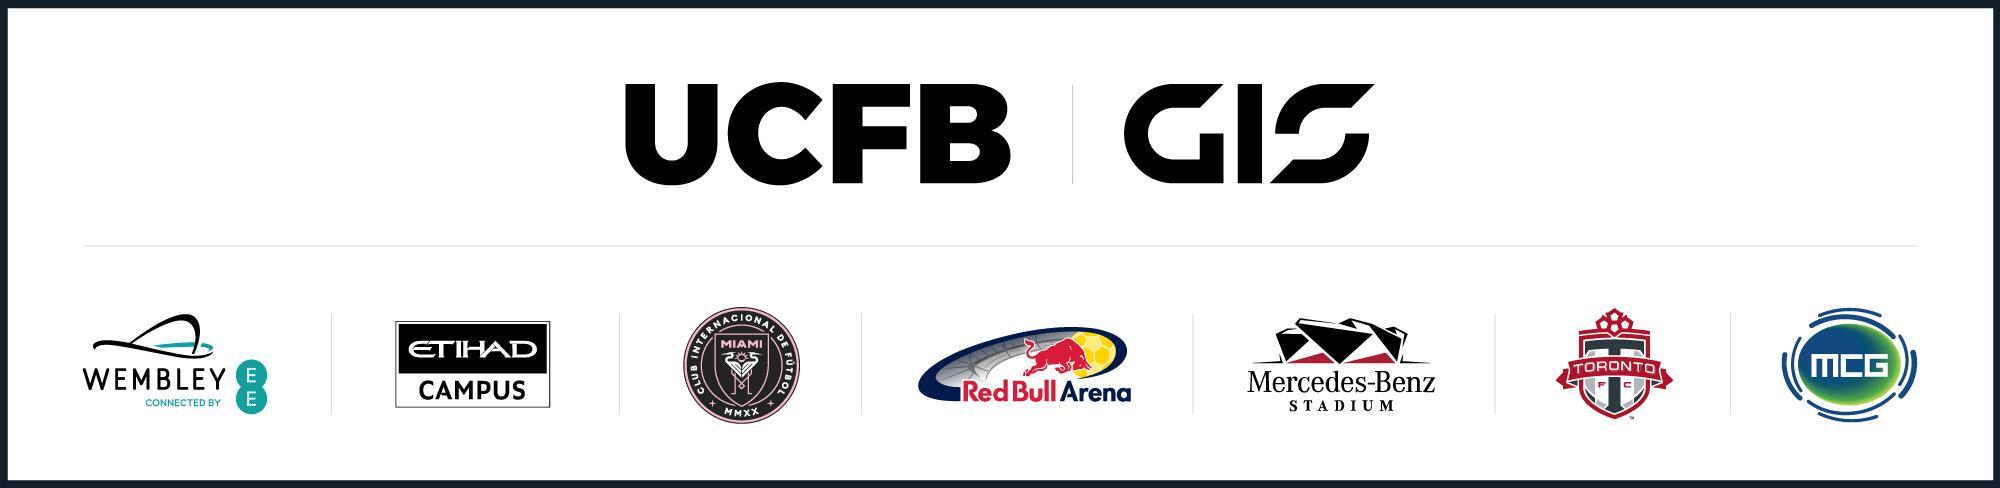 UCFB-GIS-hubs-stacked-black-boxed